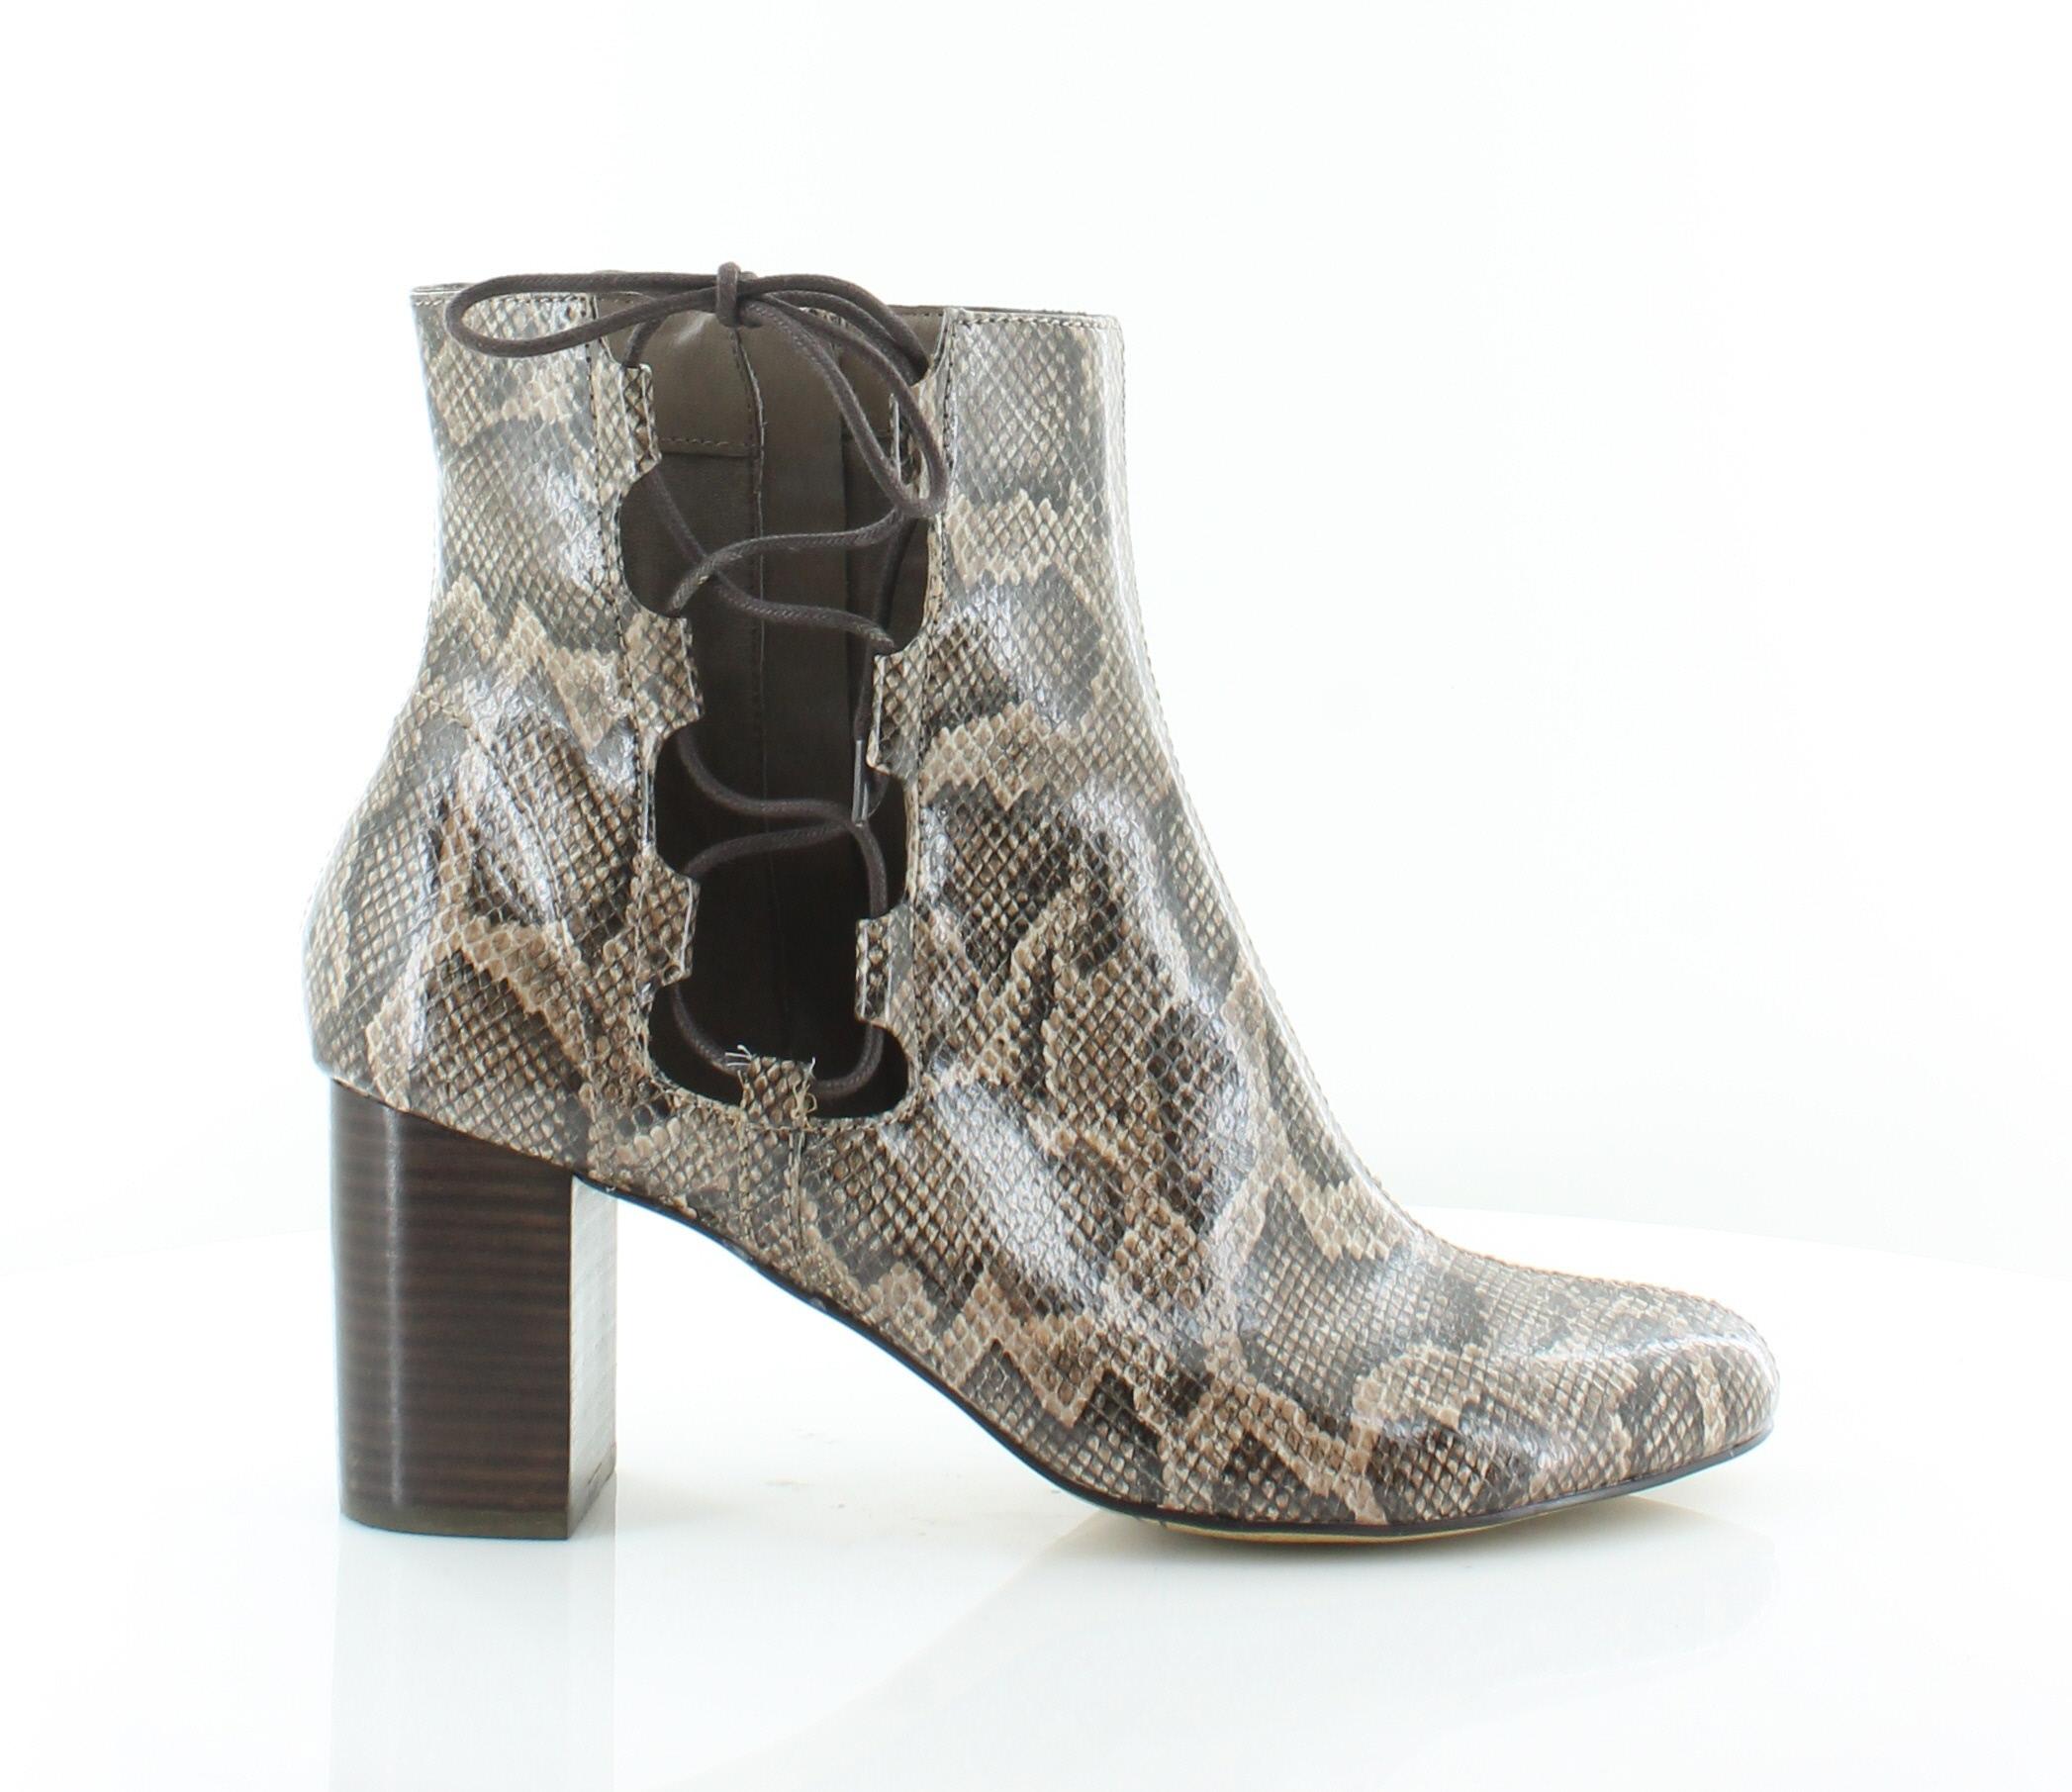 Bella Vita Kirby II Women's Boots Natural Snake Size 10.5 W